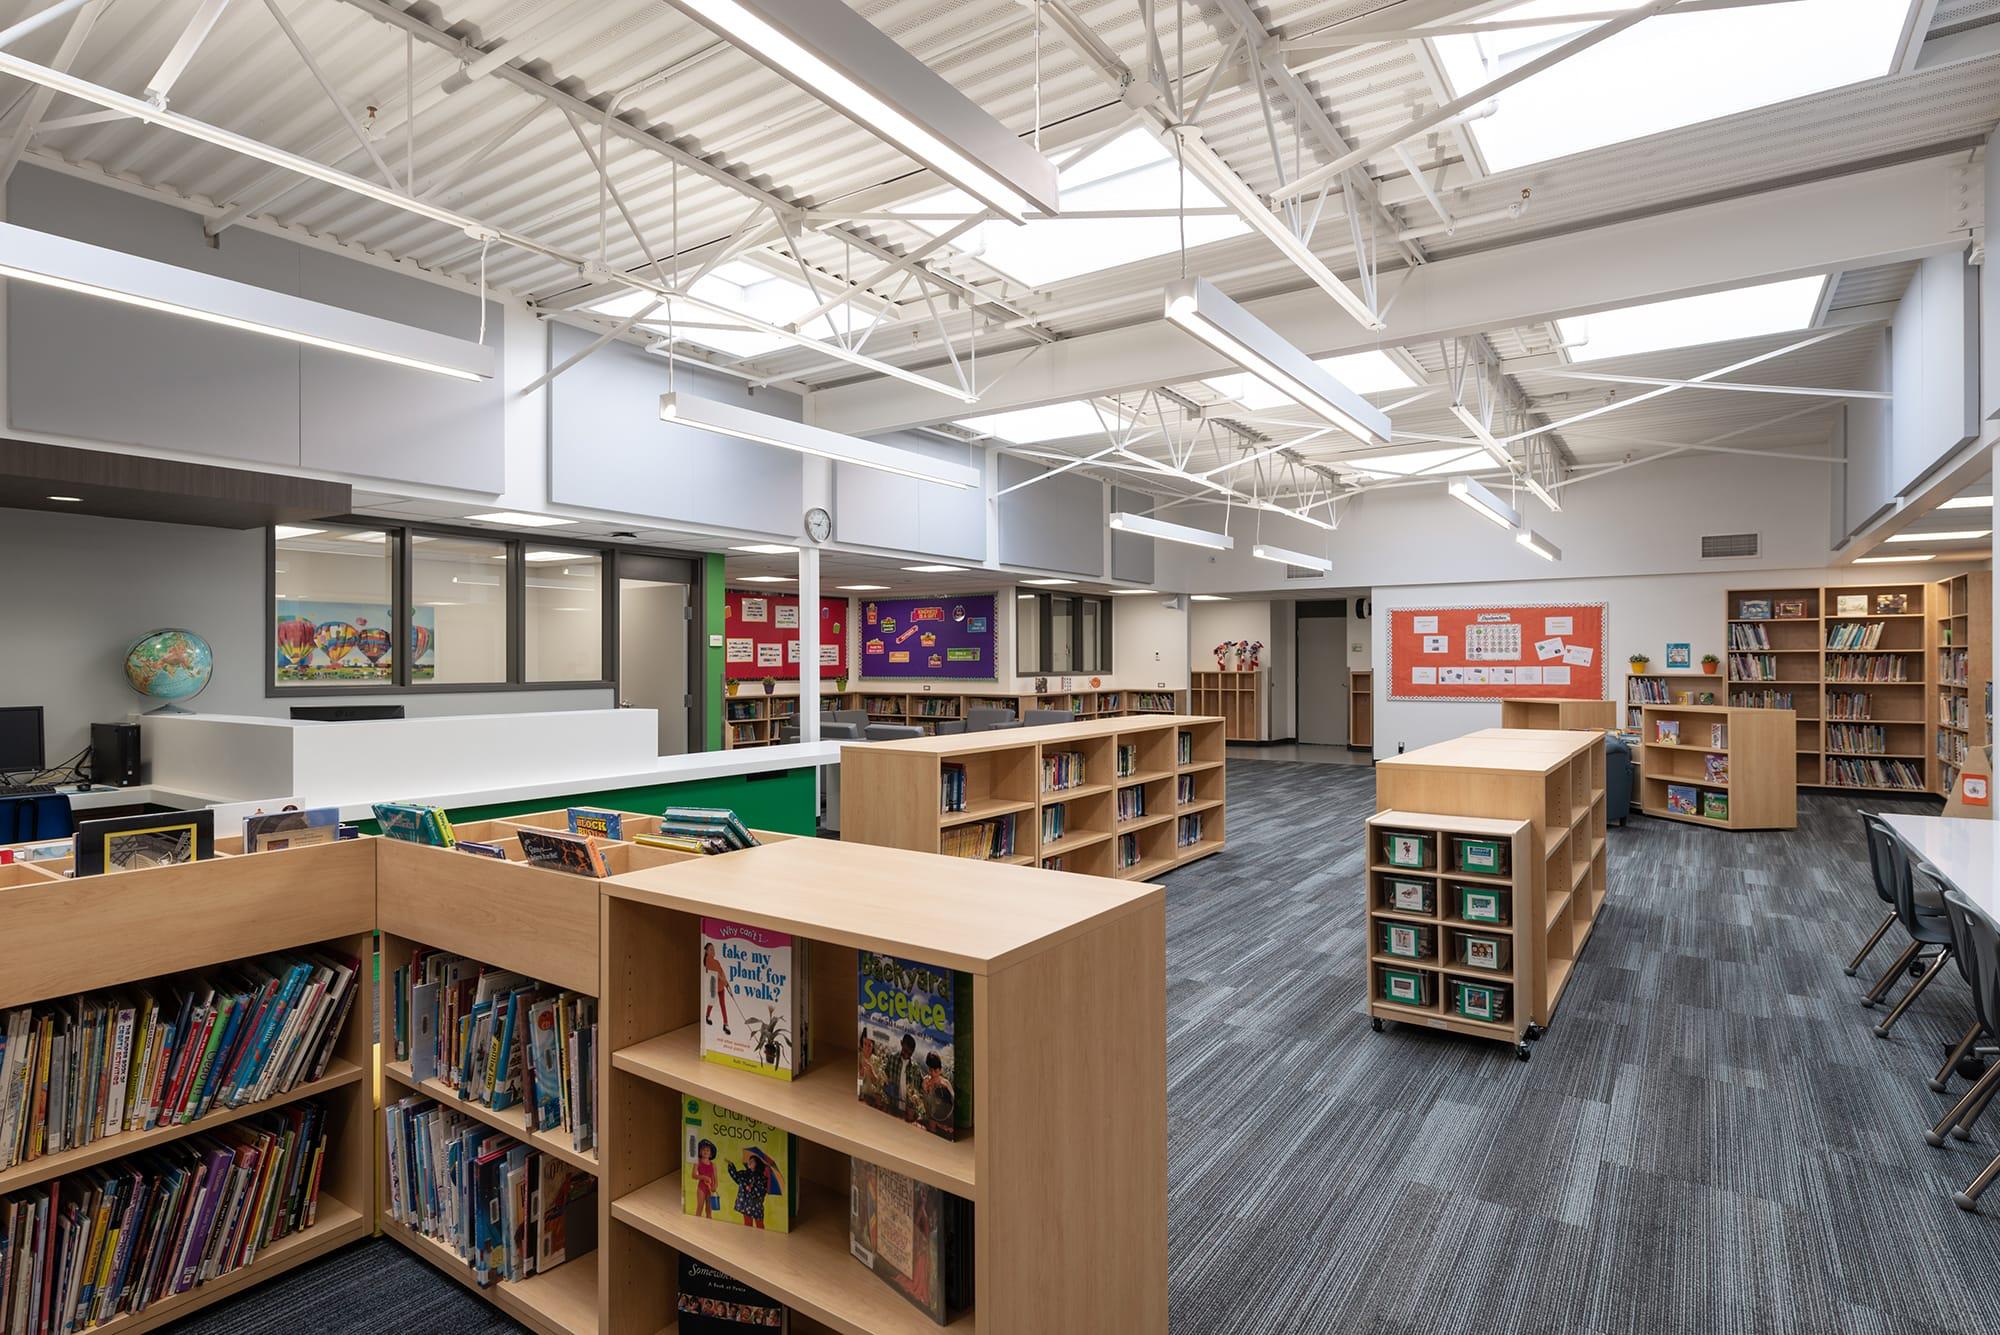 Caernarvon Elementary School library